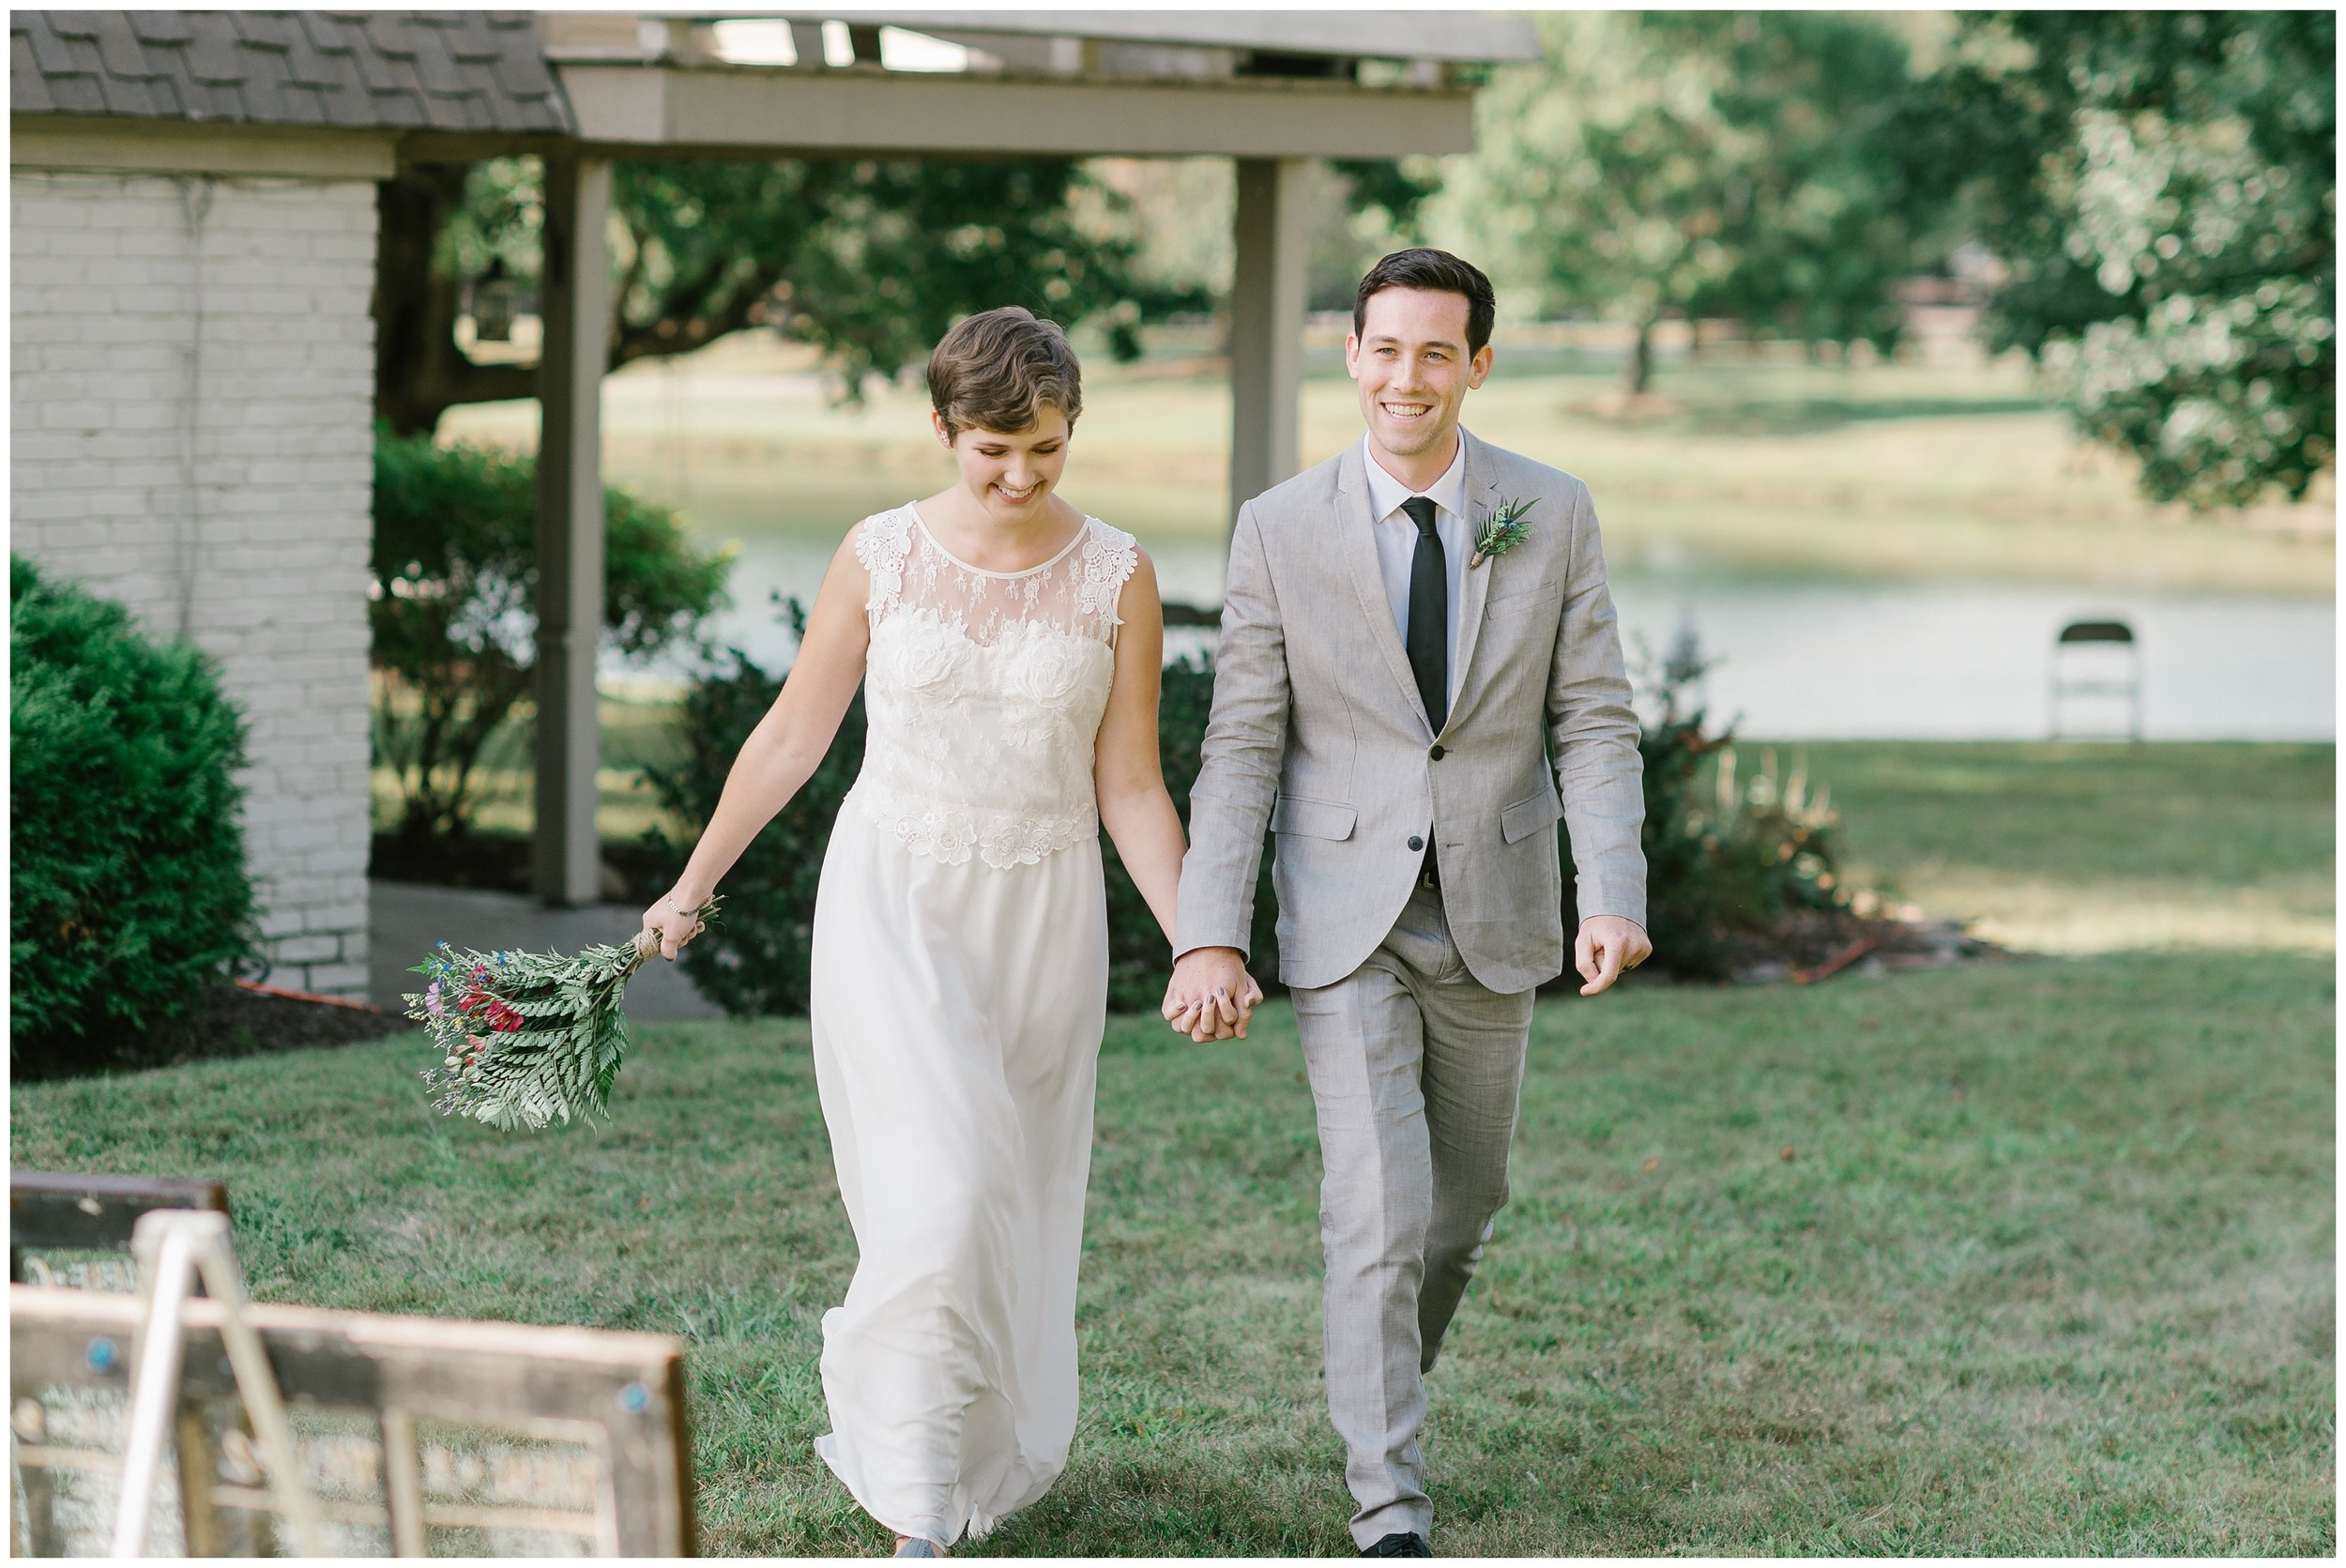 Rebecca_Shehorn_Photography_Indianapolis_Wedding_Photographer_7271.jpg